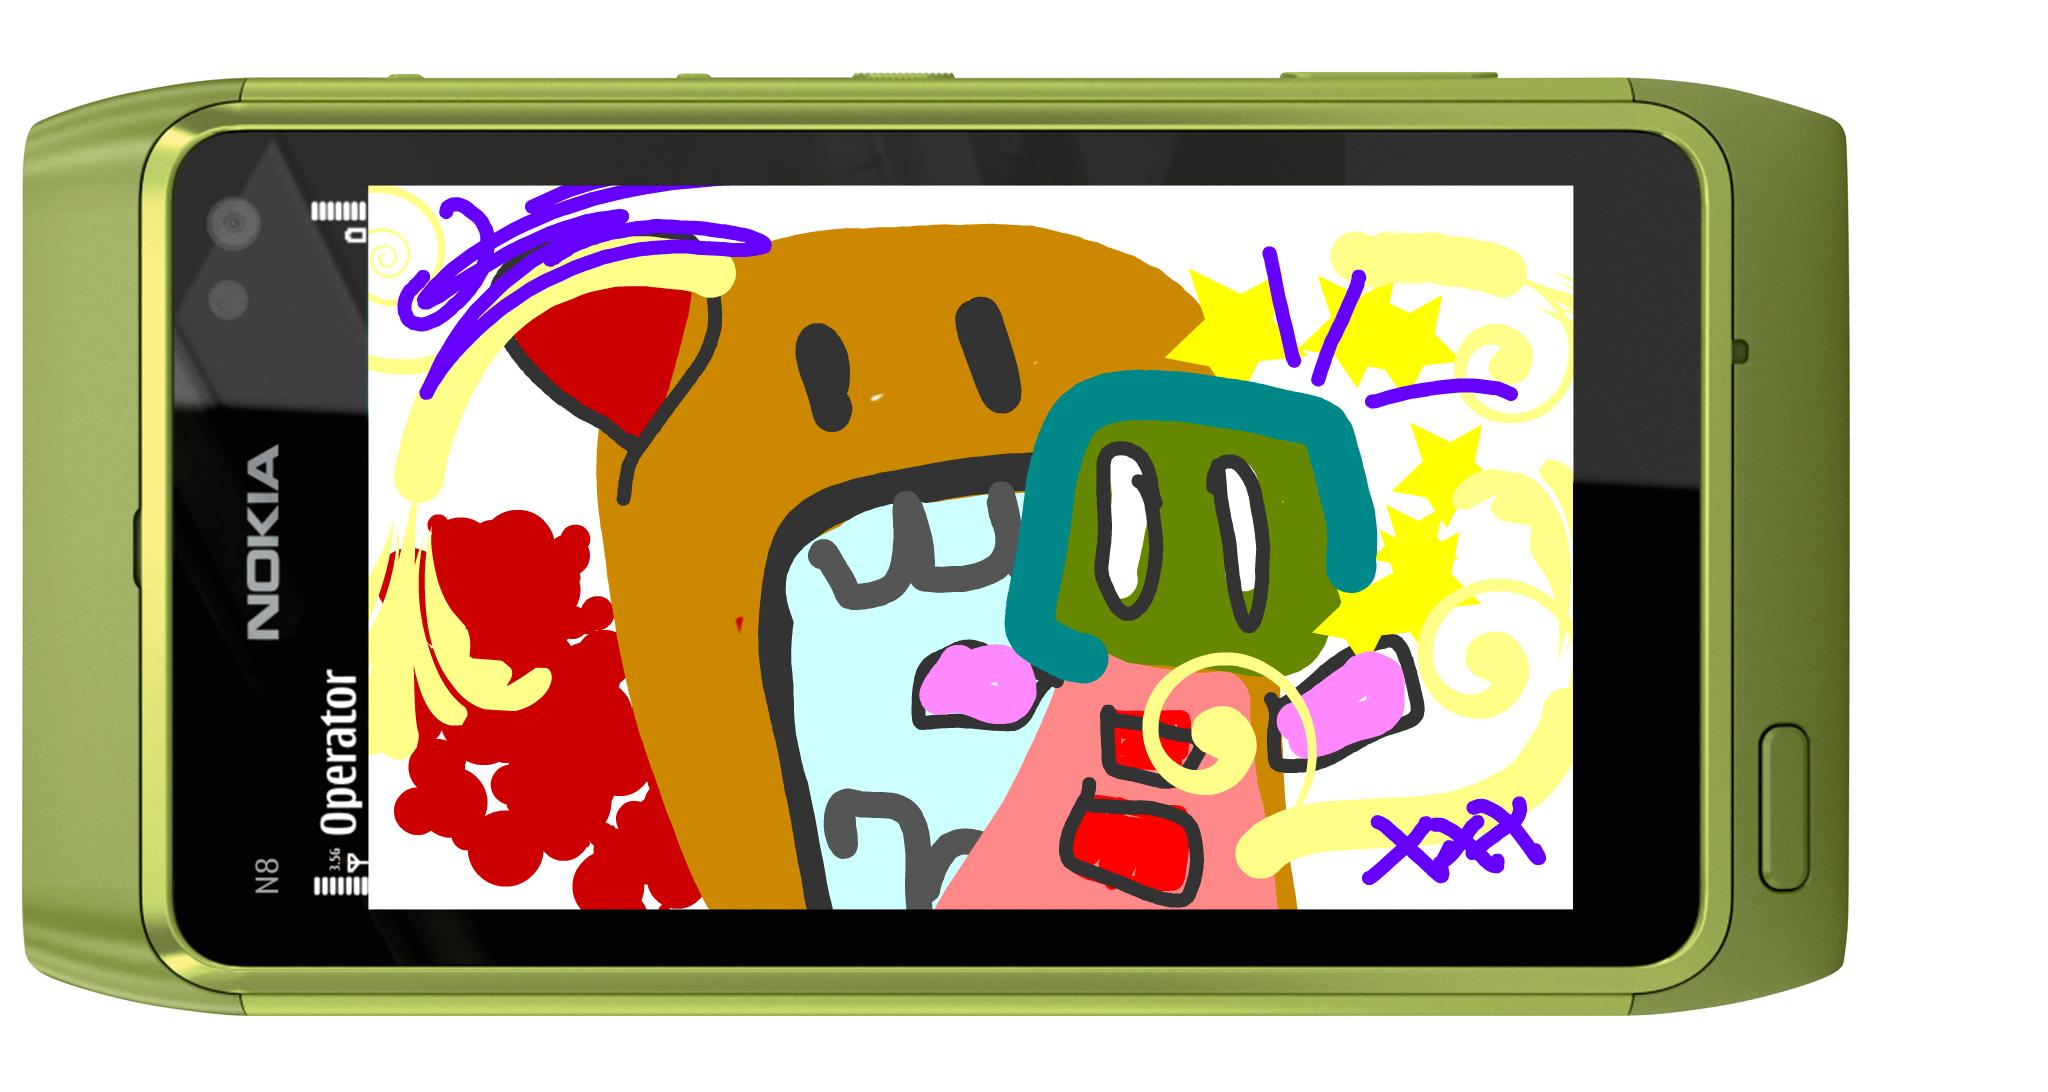 Nokia Art